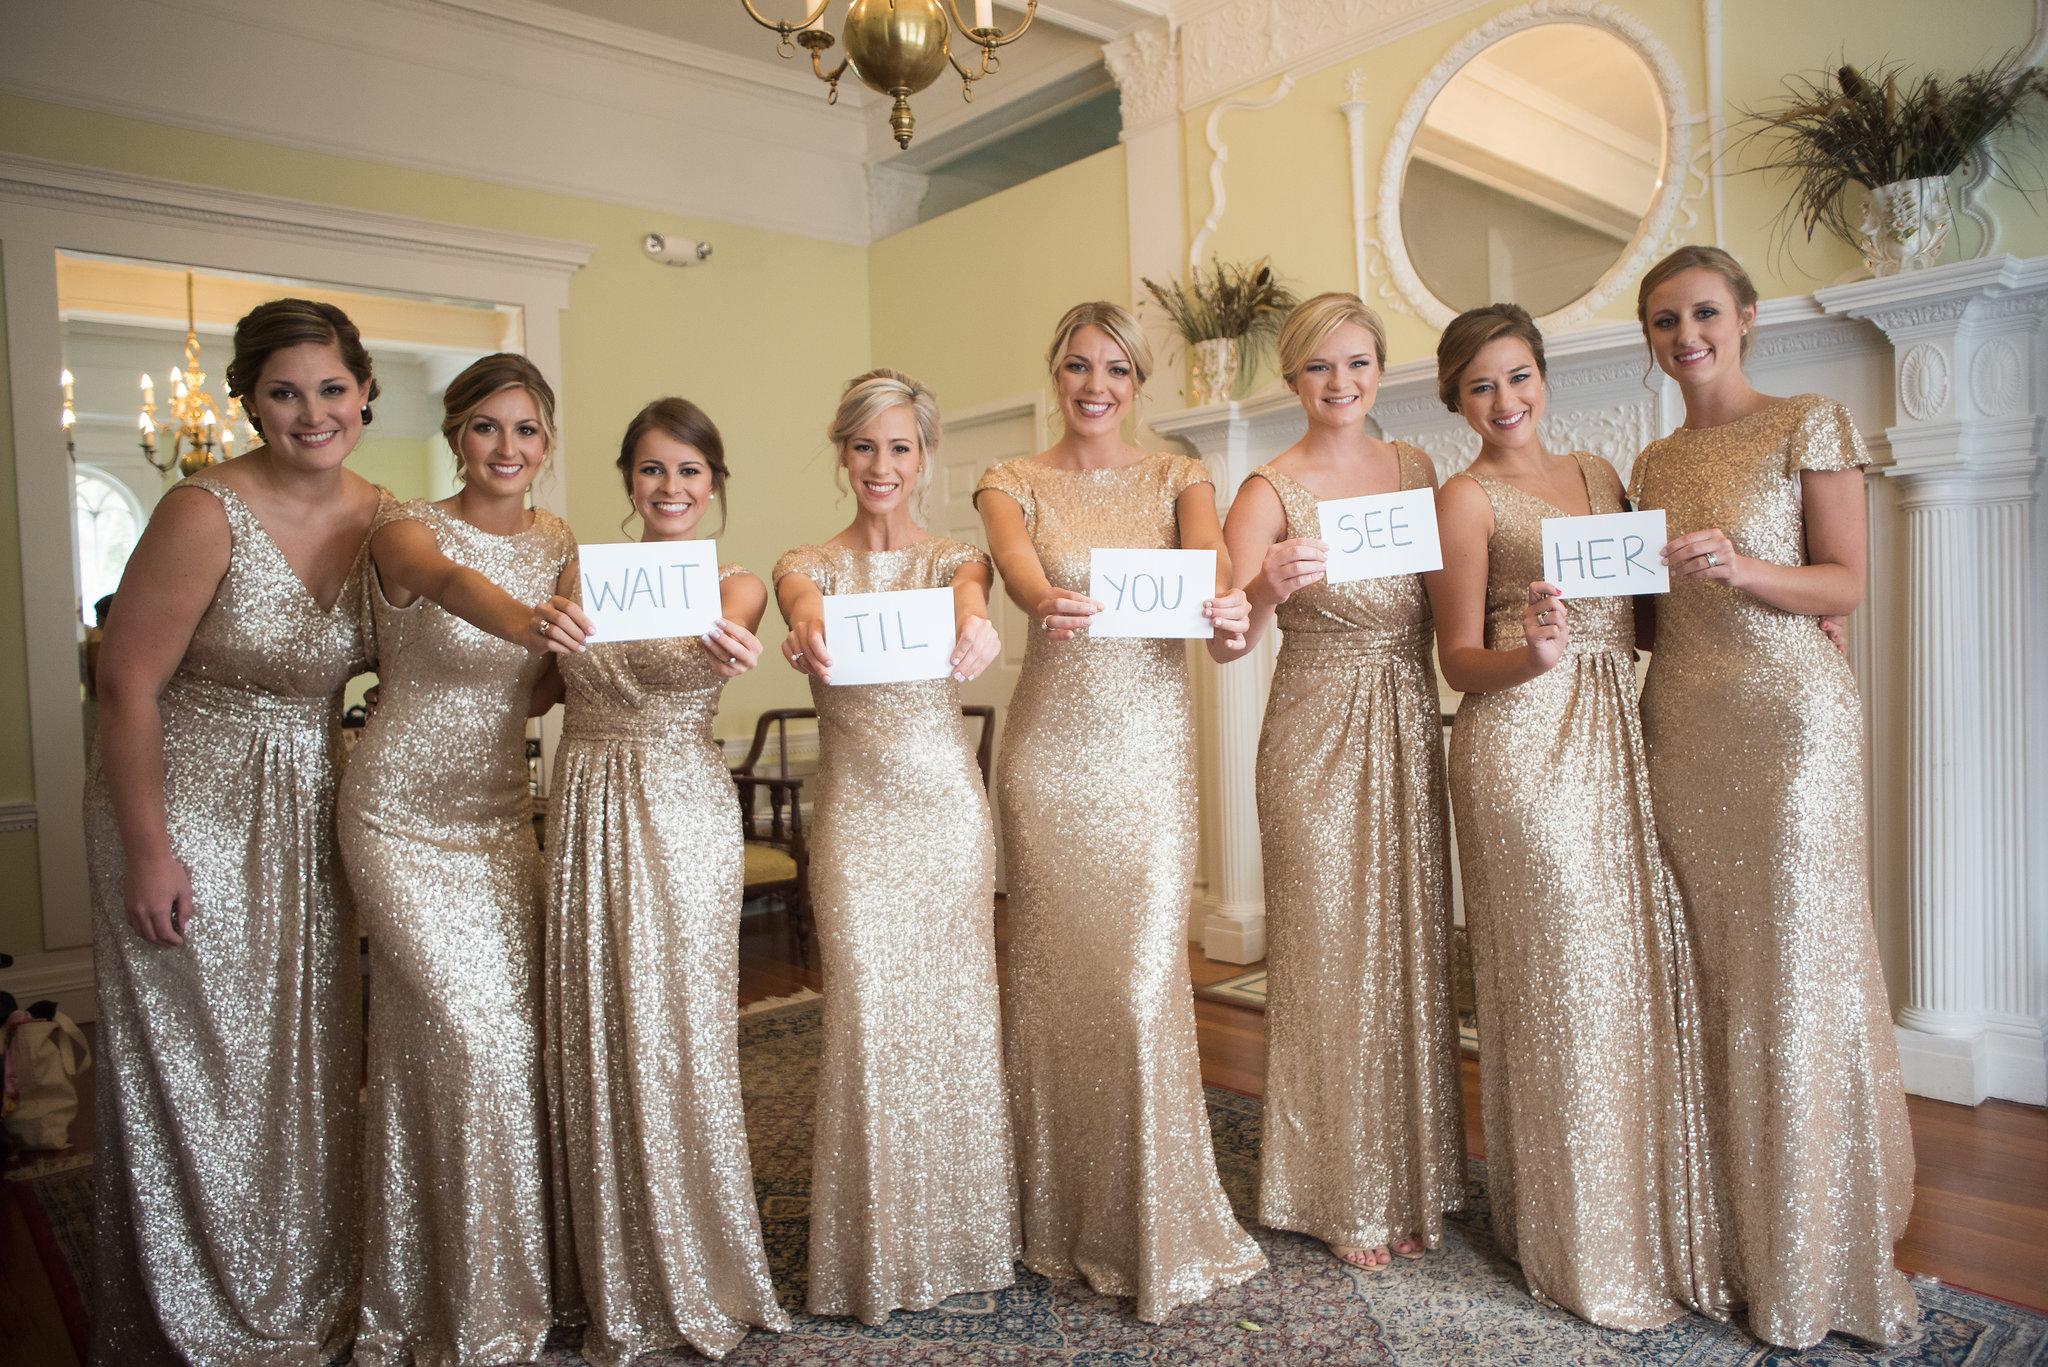 st-augustine-wedding-photographer-sarah-annay-photography.jpg33.jpg